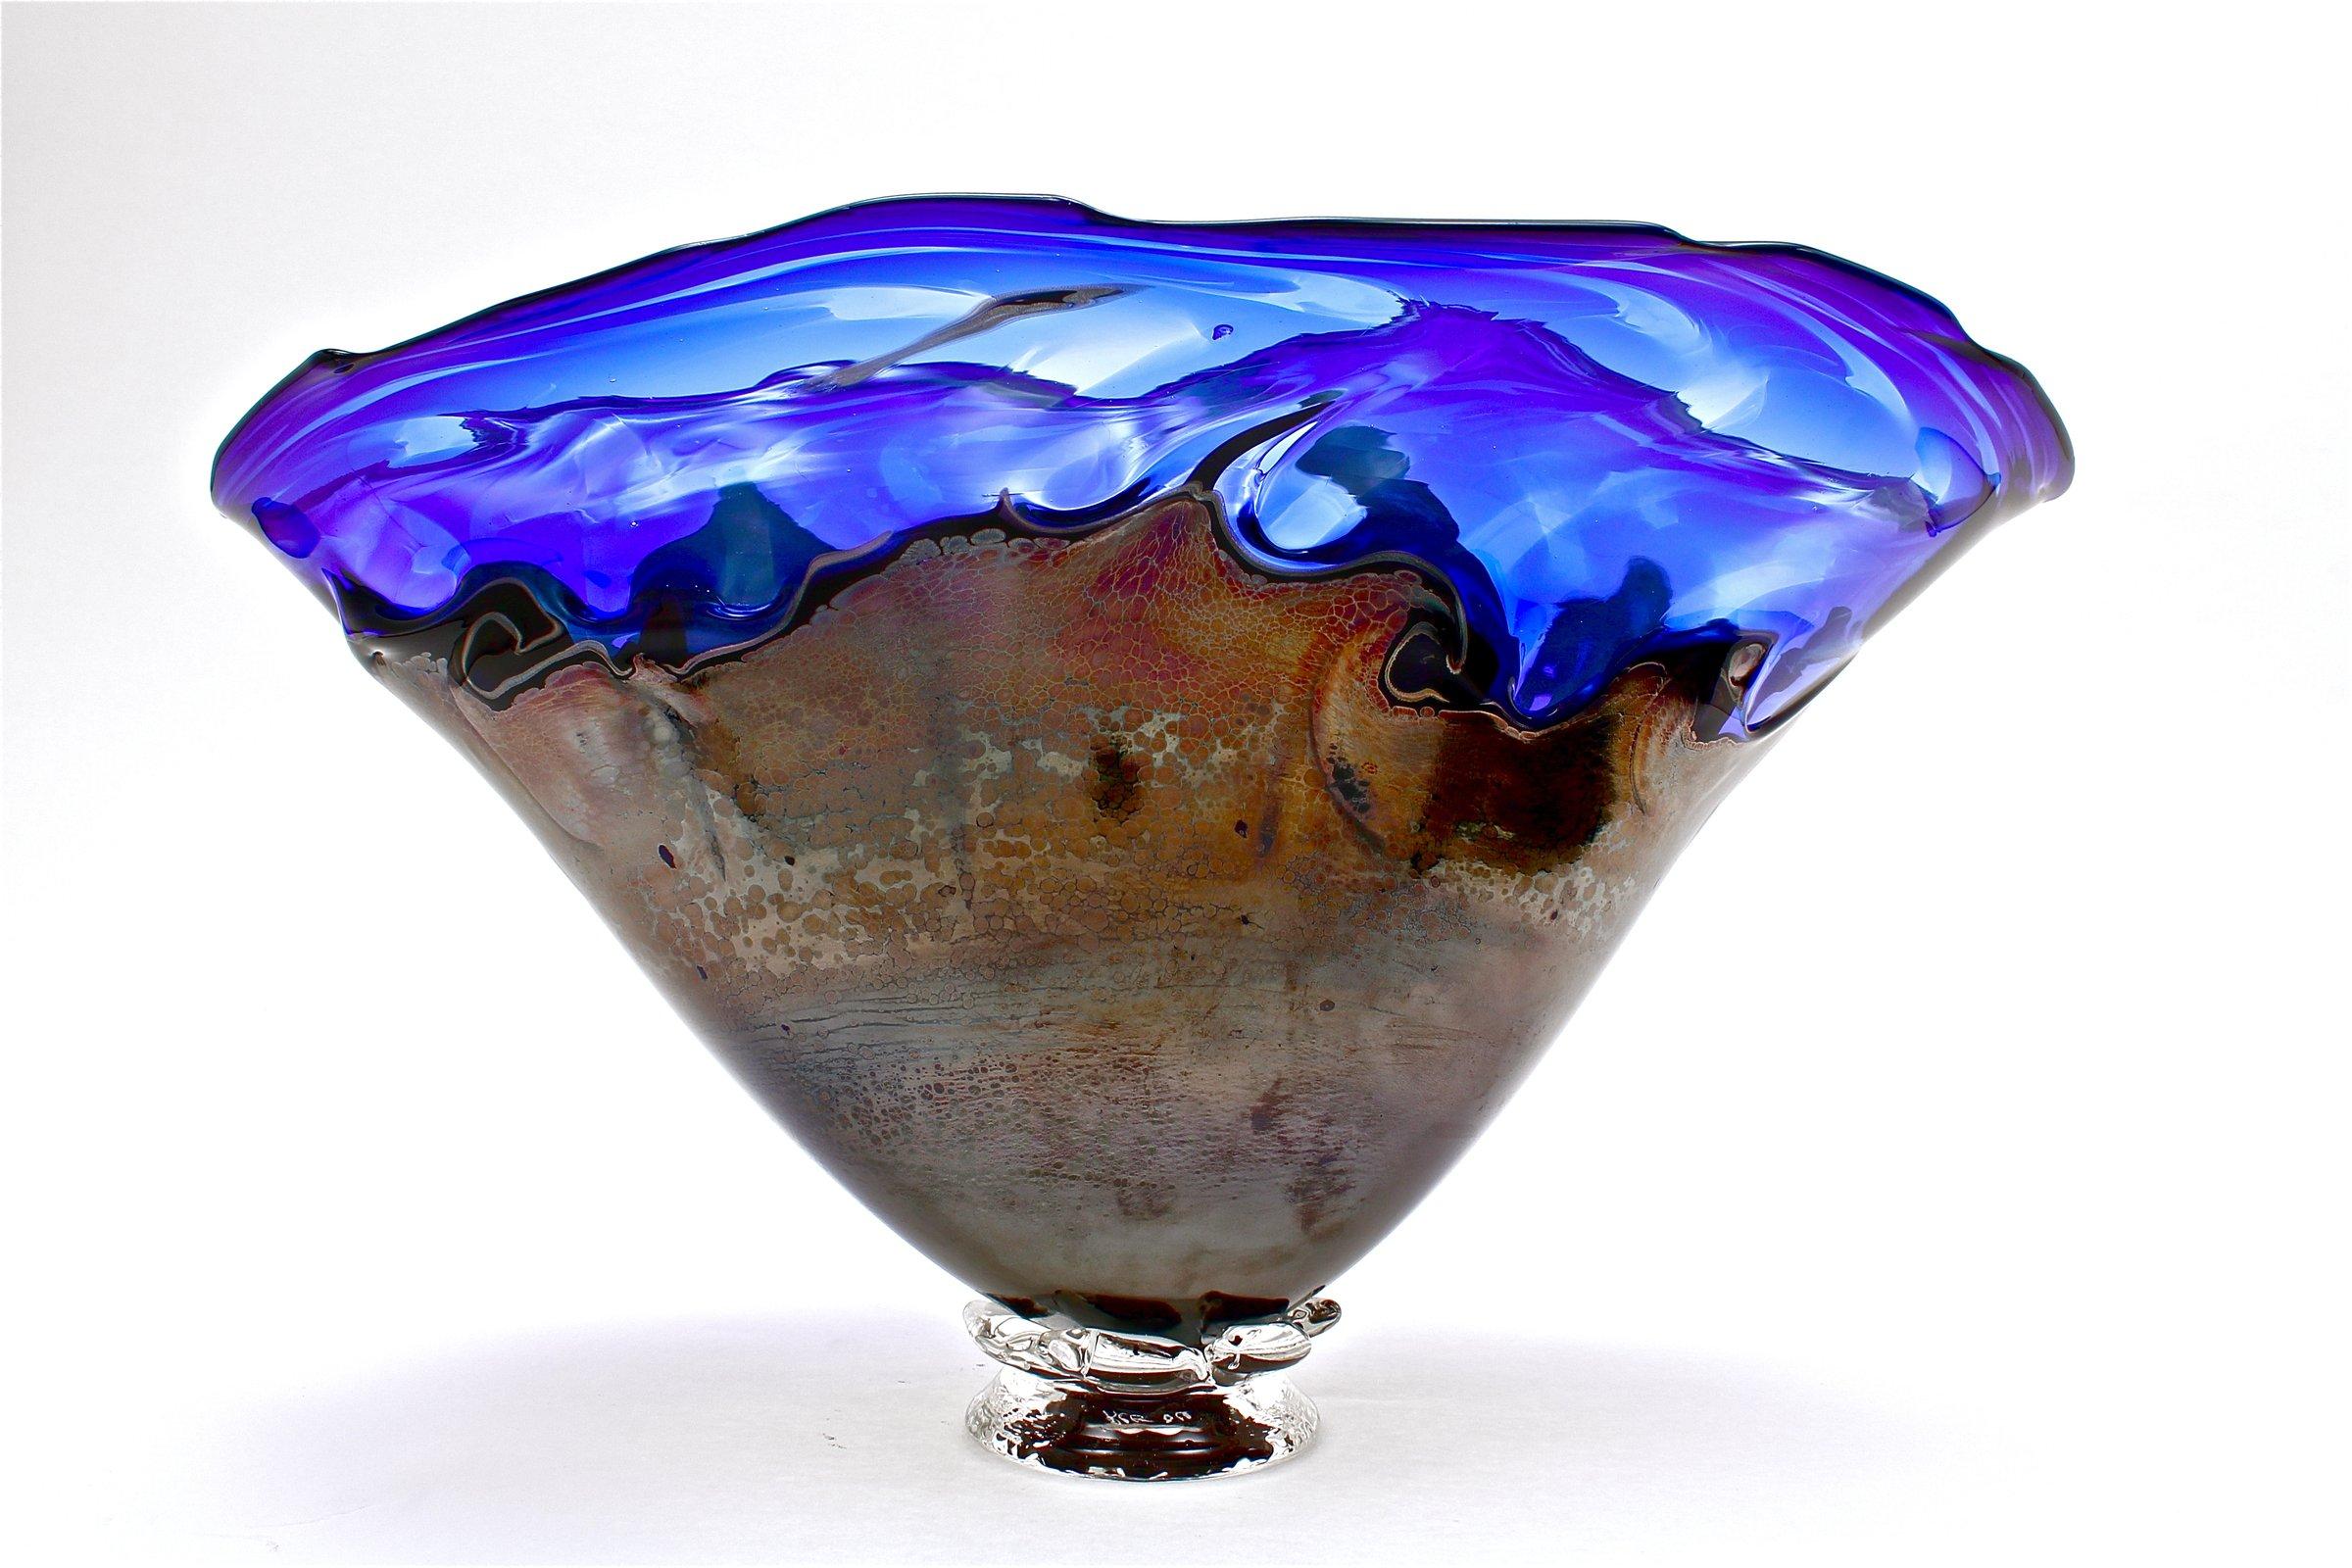 Large Glass Vessel : ... Overlay Bowl by Dierk Van Keppel (Art Glass Vessel) Artful Home